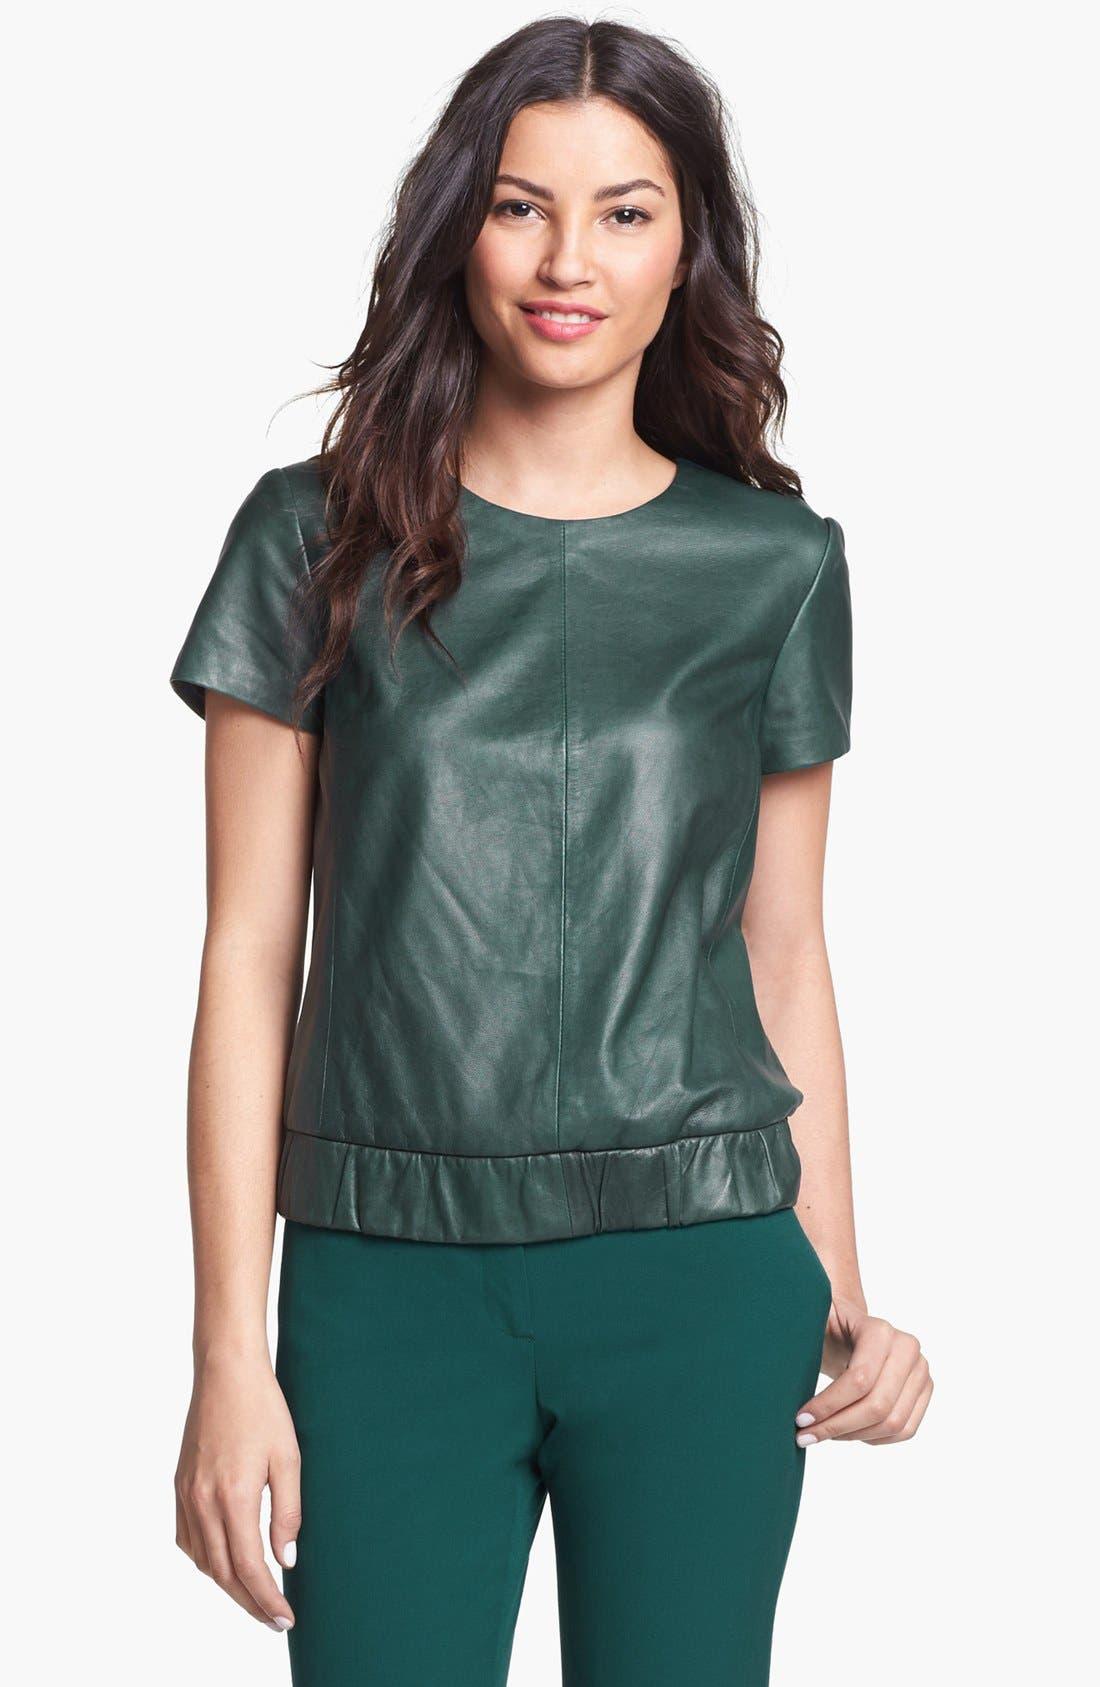 Alternate Image 1 Selected - Halogen® Leather Front Elastic Waist Top